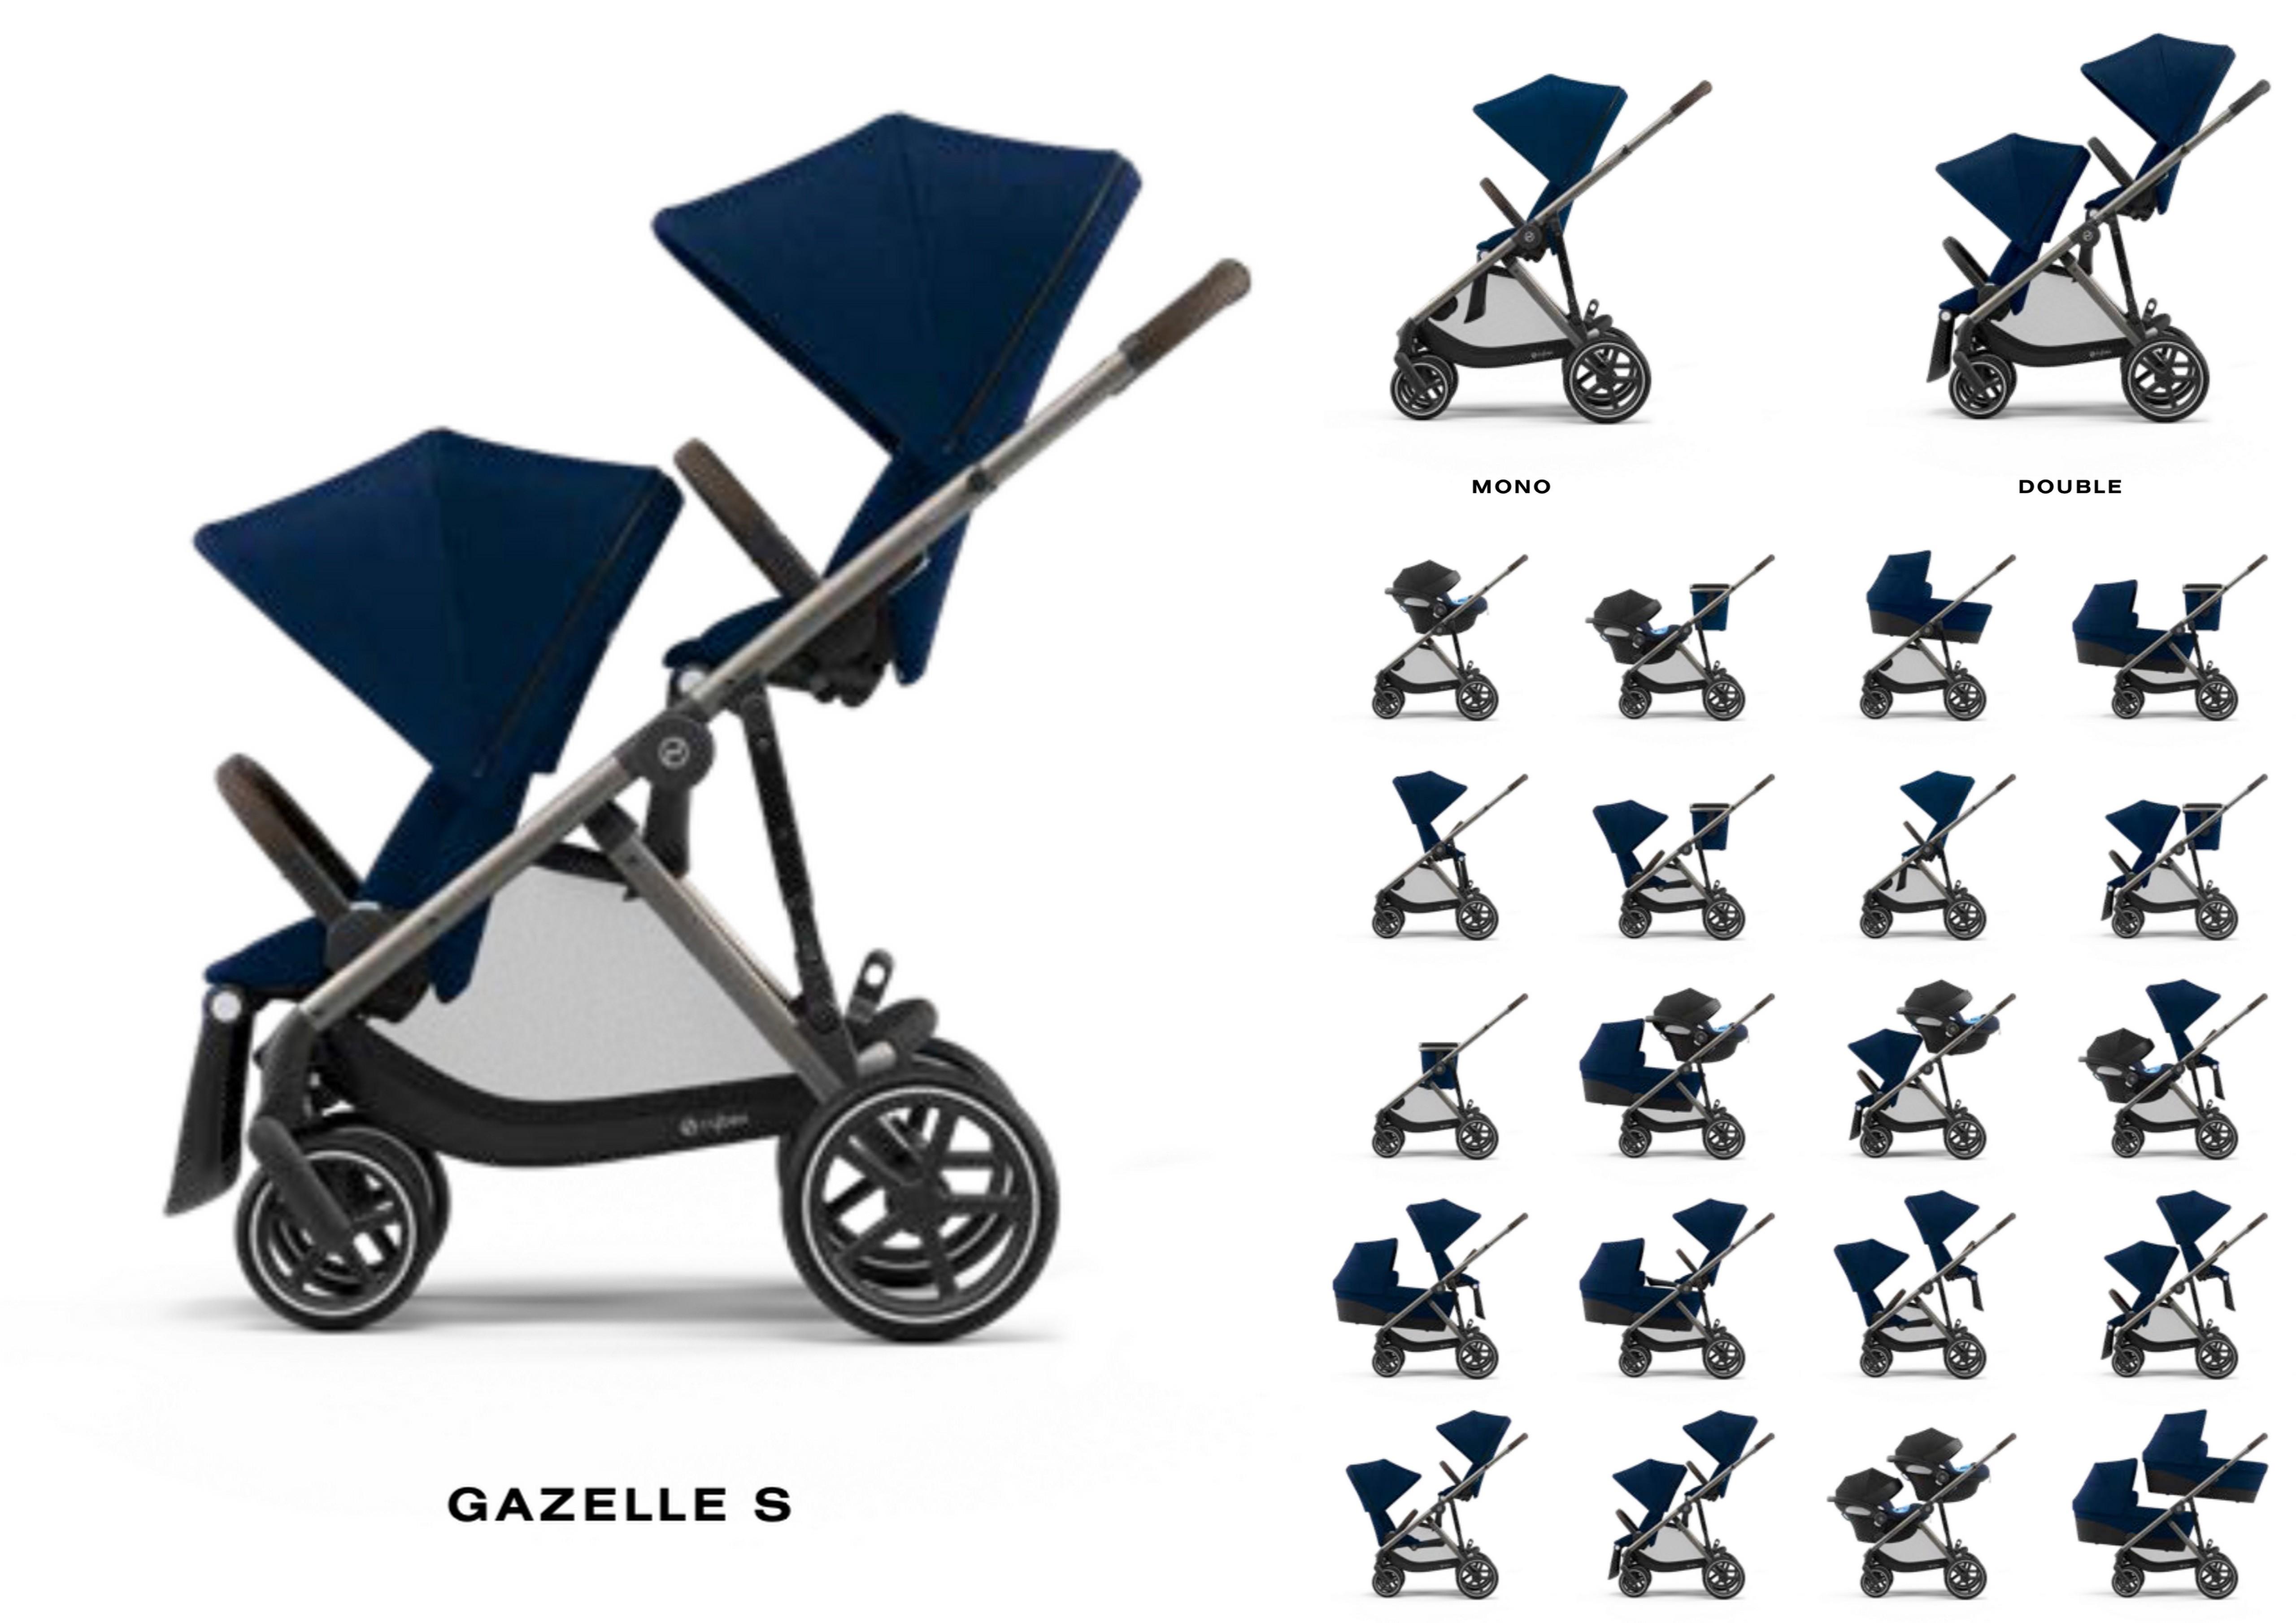 Cybex Gazelle S